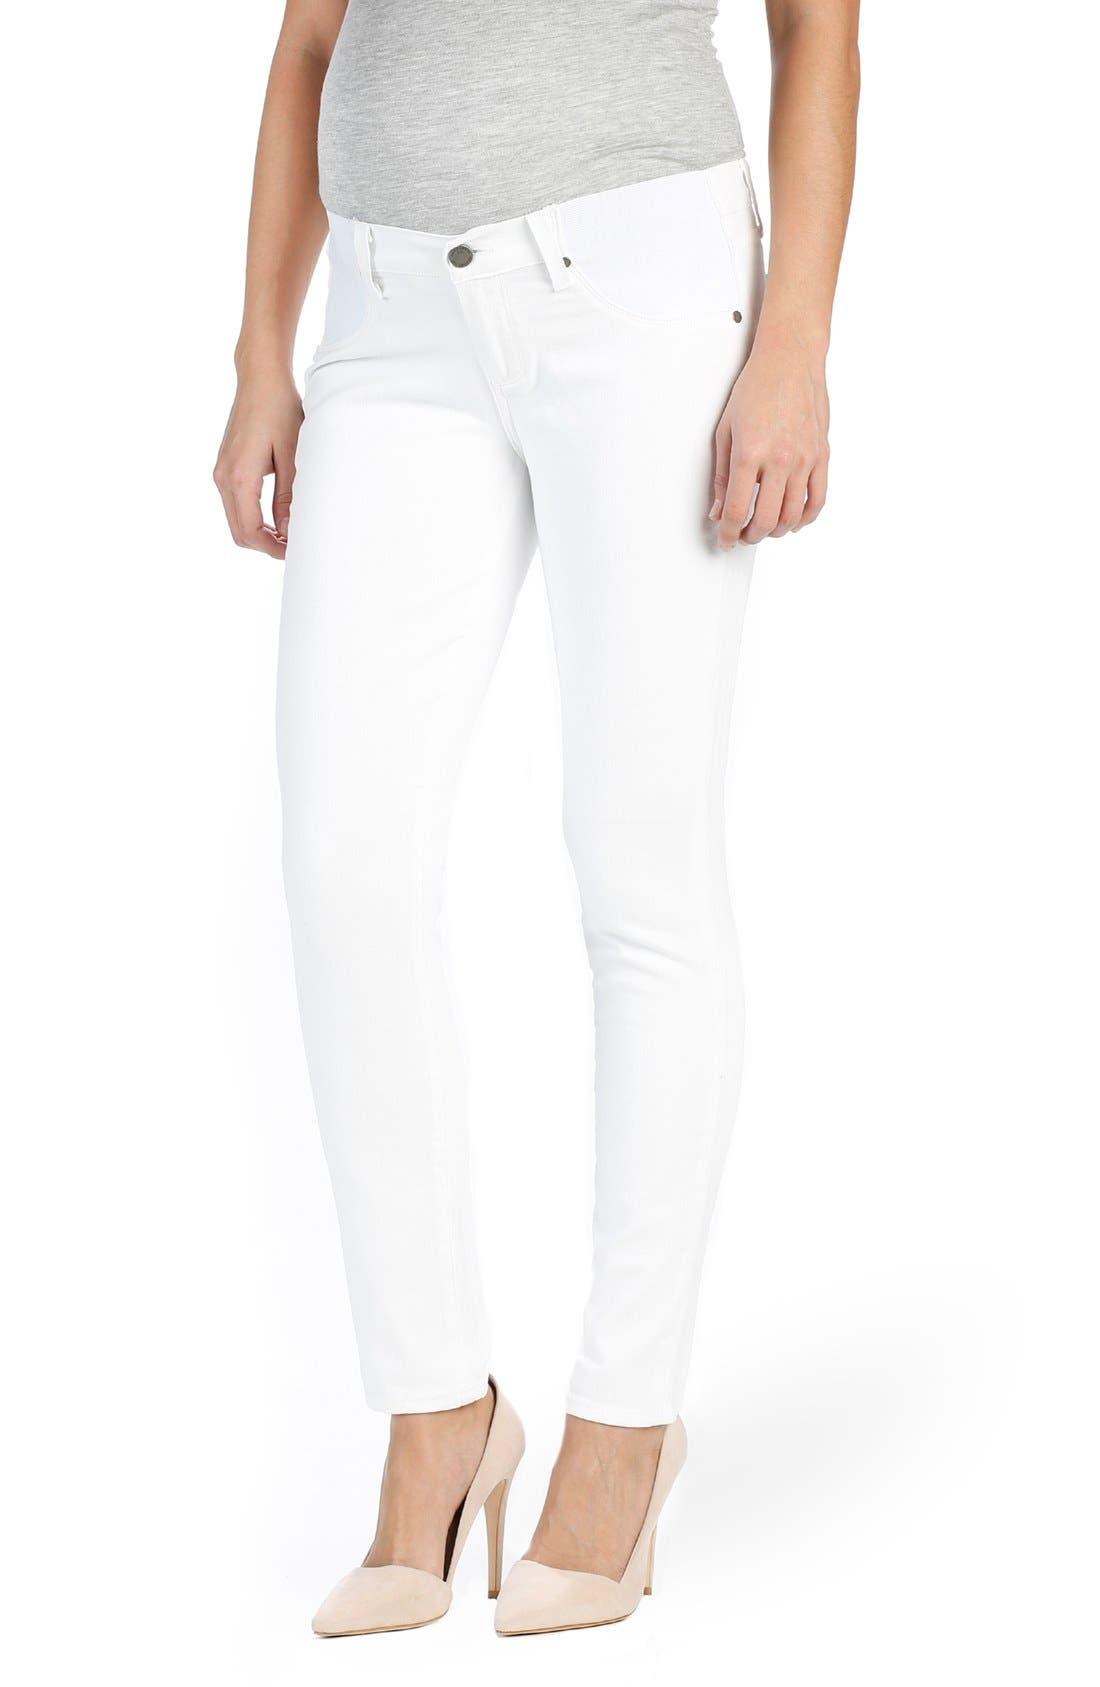 Women's Paige 'Skyline' Ankle Peg Skinny Maternity Jeans